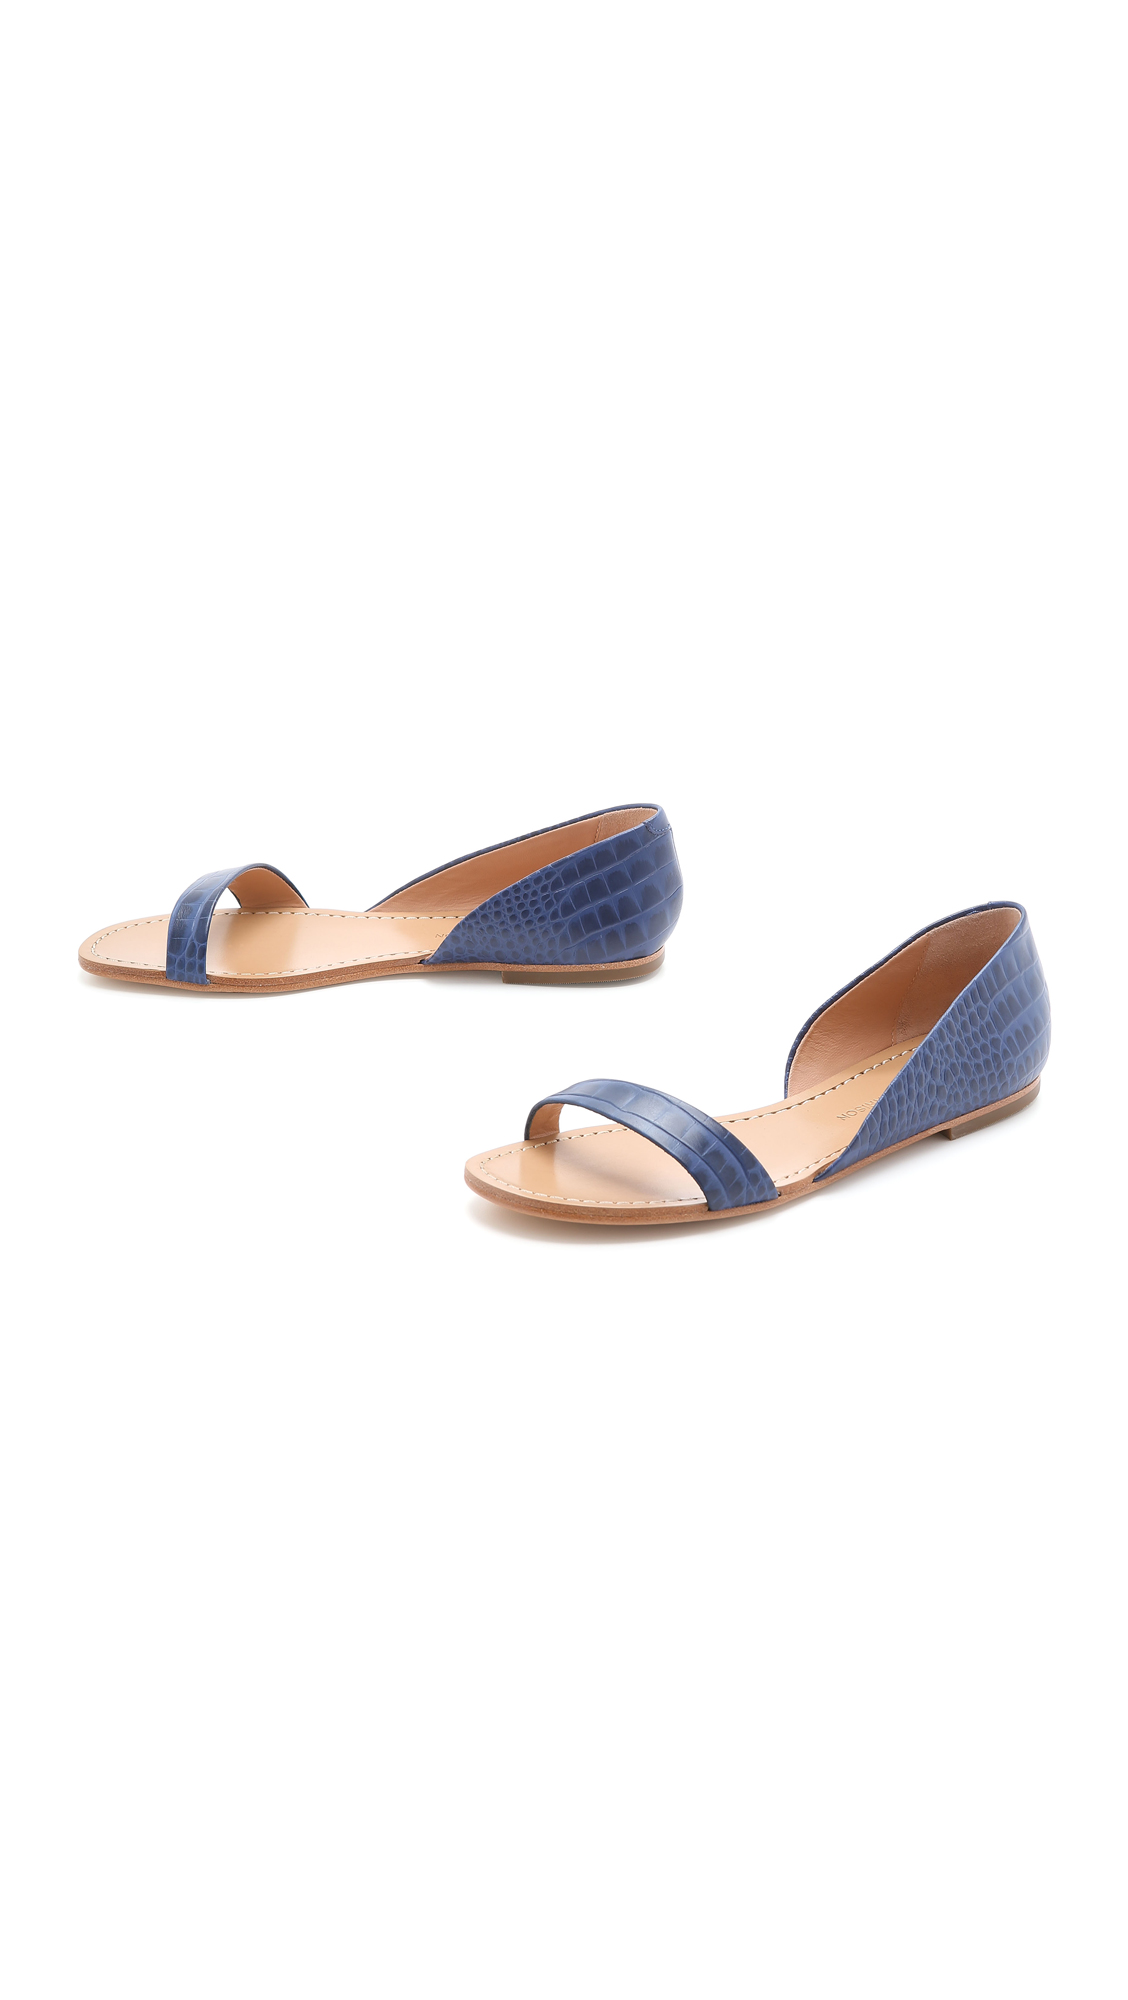 d7b86930bb17 Sigerson Morrison Kameda Flat Sandals